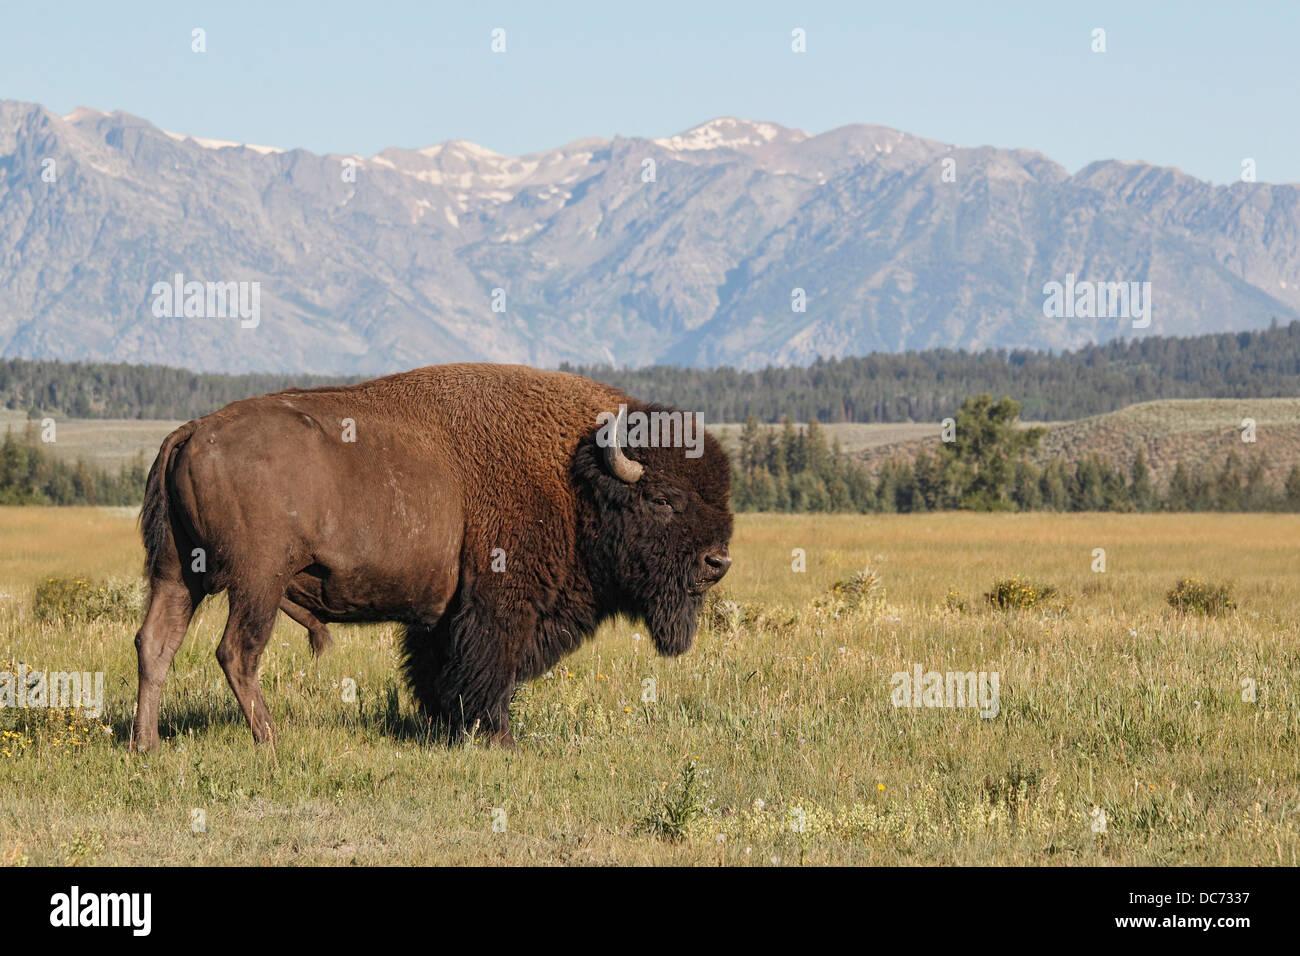 American Bison (Bison bison), Grand Teton National Park - Stock Image